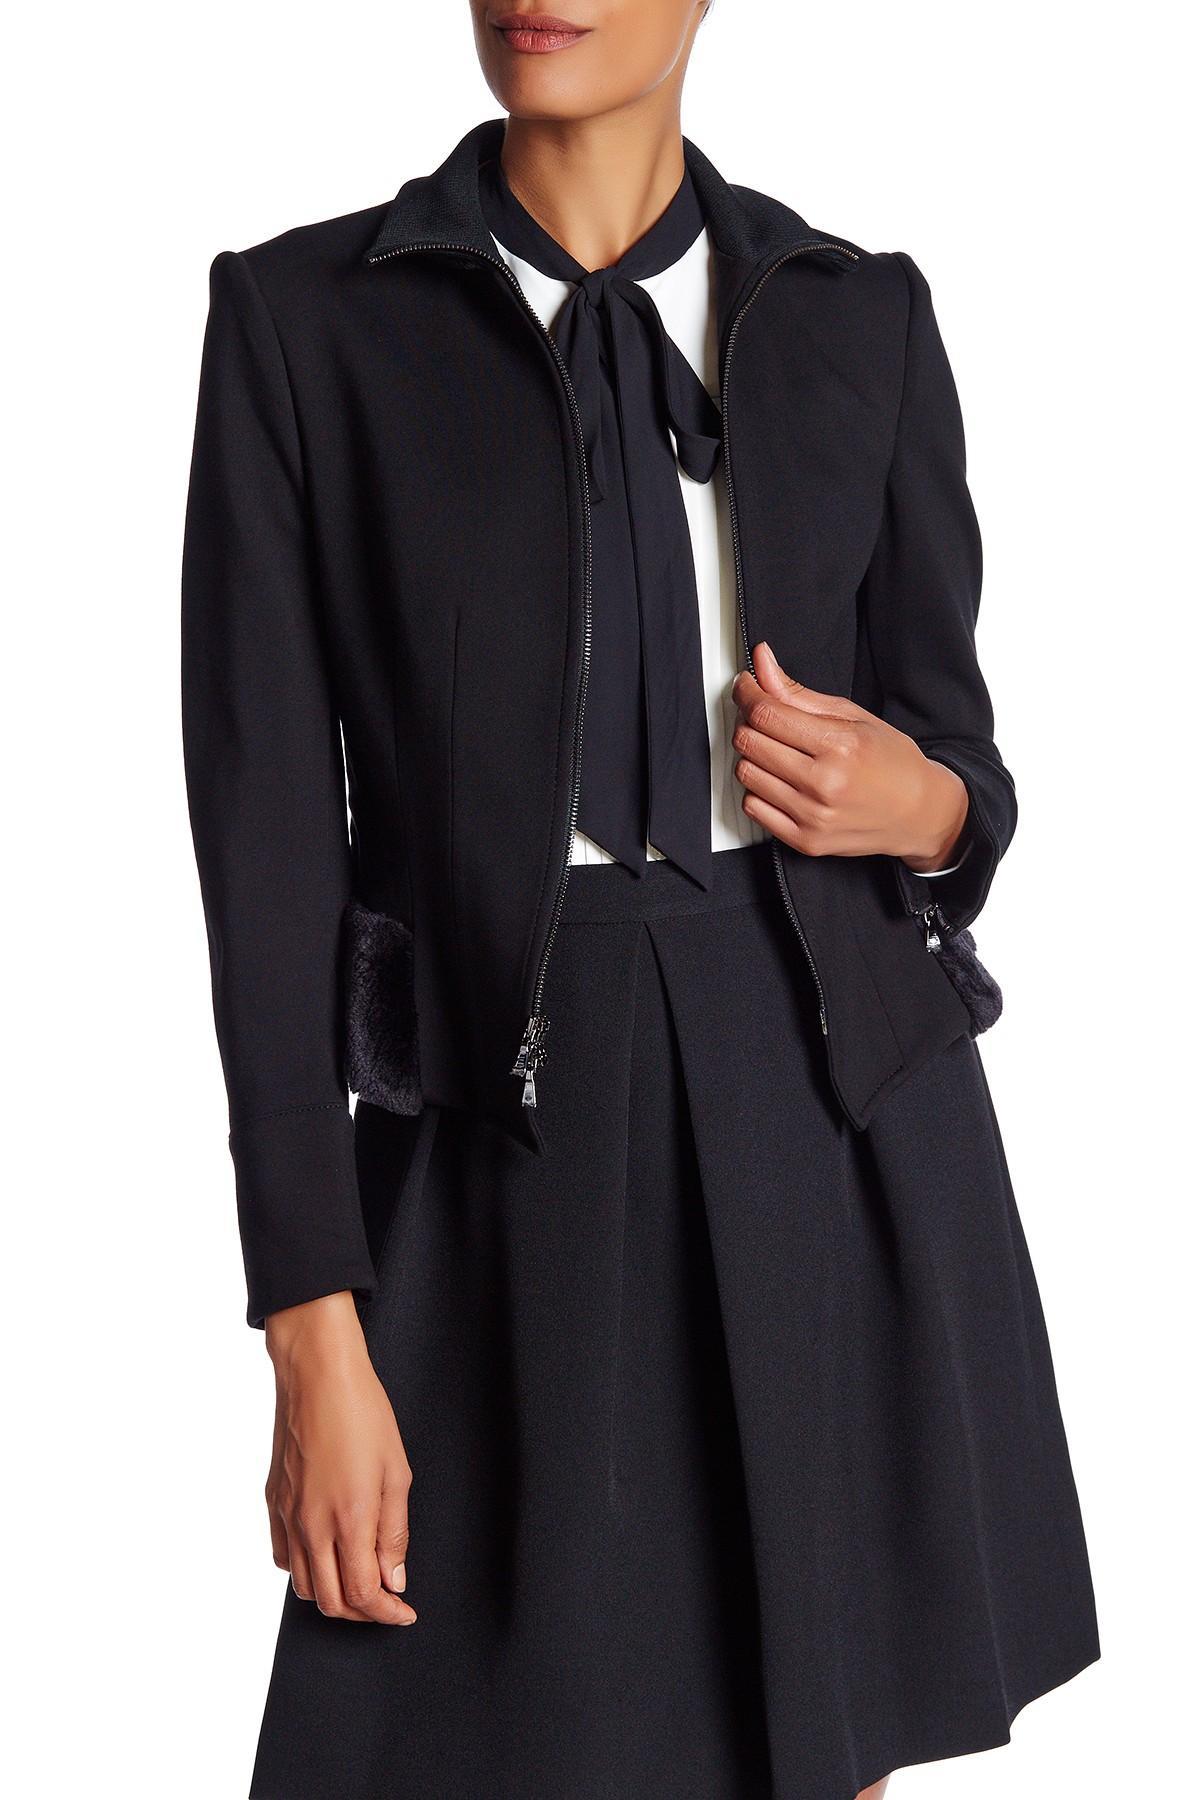 Lyst Anne Klein Faux Fur Trim Peplum Jacket In Black